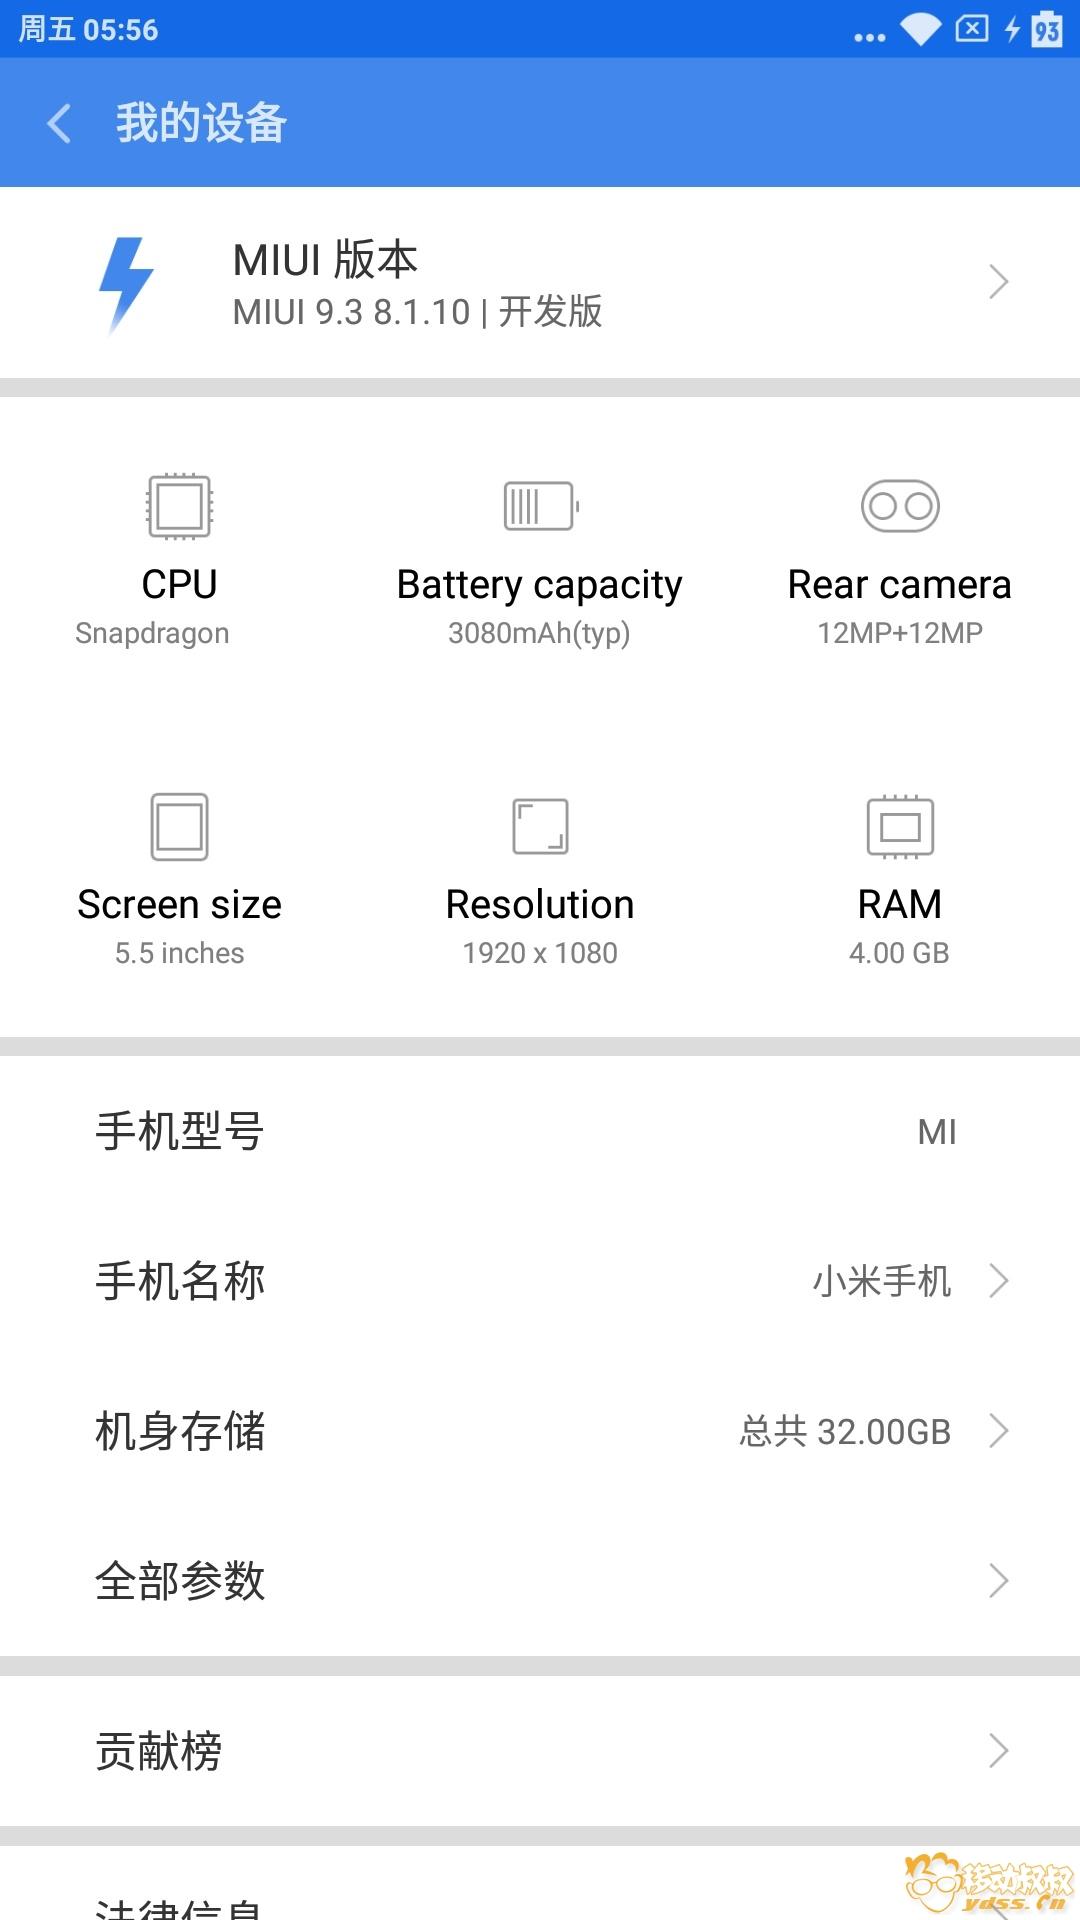 InkedScreenshot_2018-01-12-17-56-14-191_com.android.settings_LI.jpg